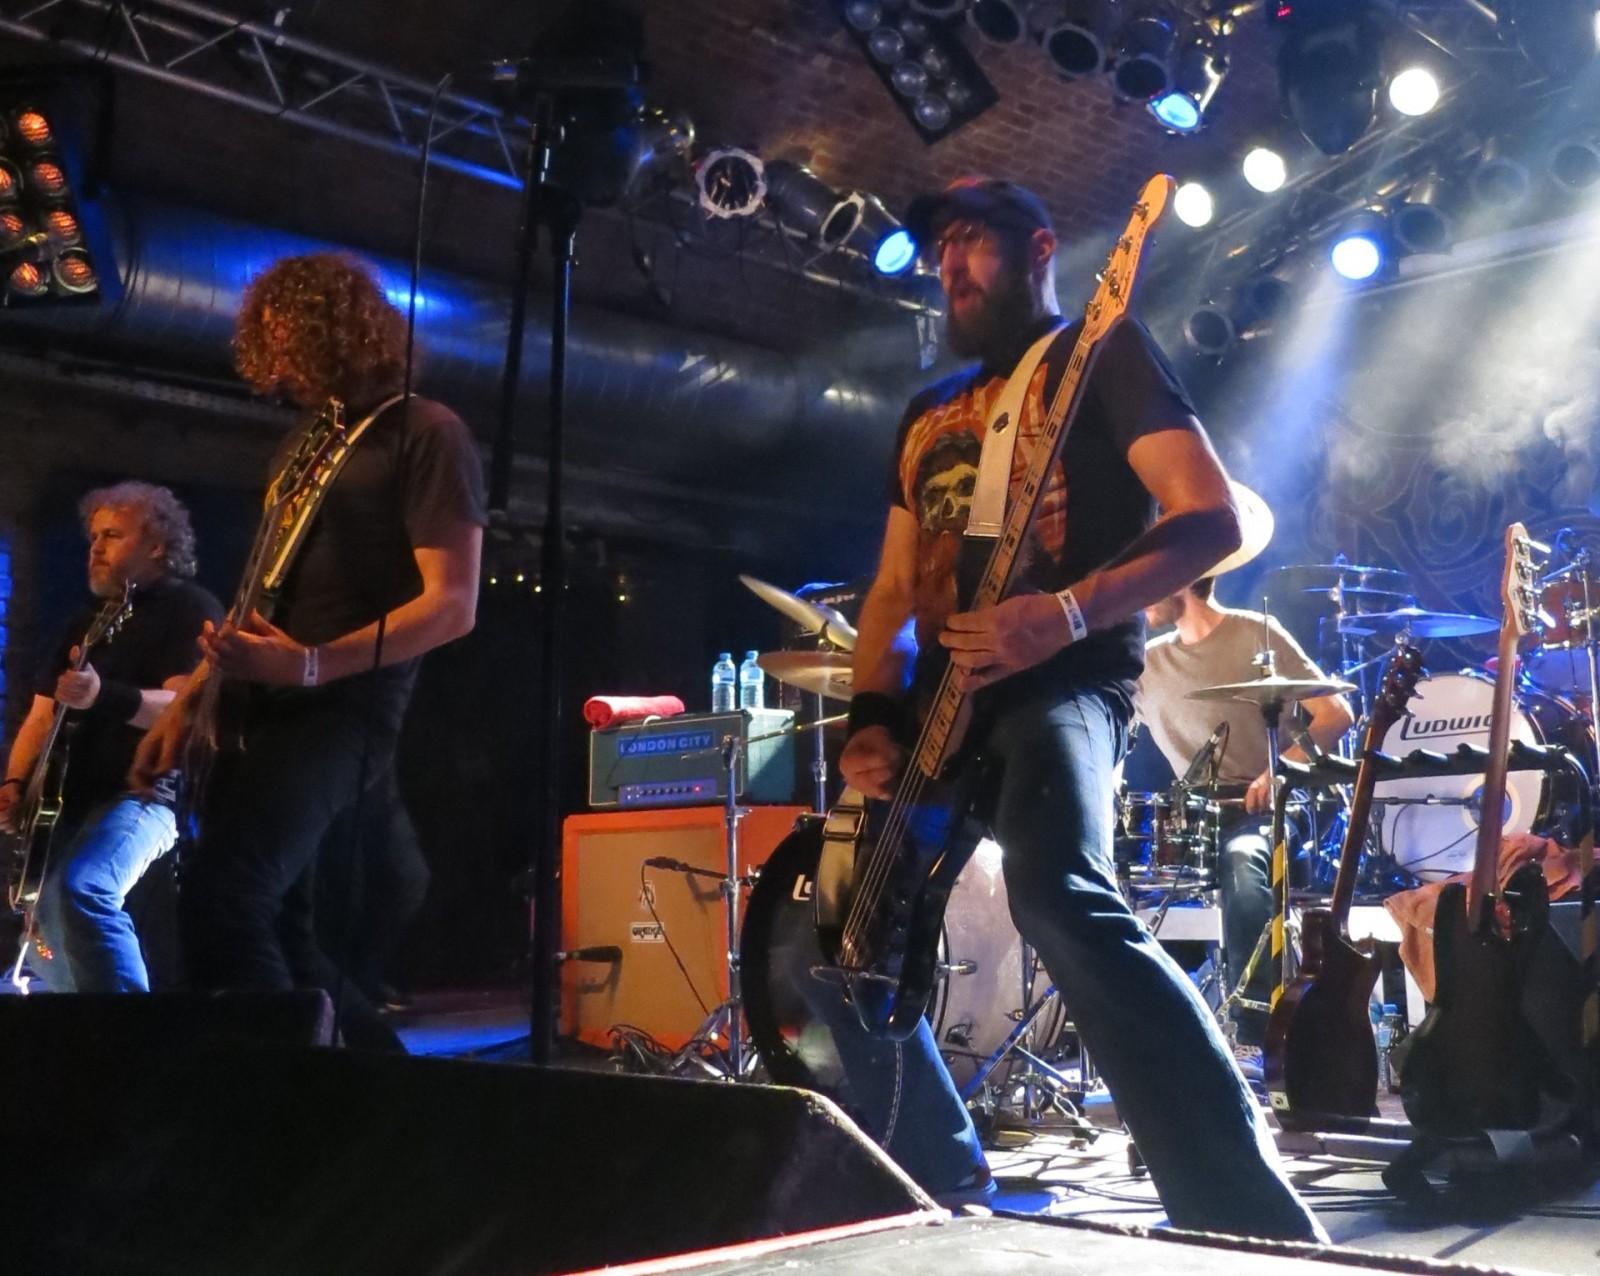 KOMATSU in Bochum